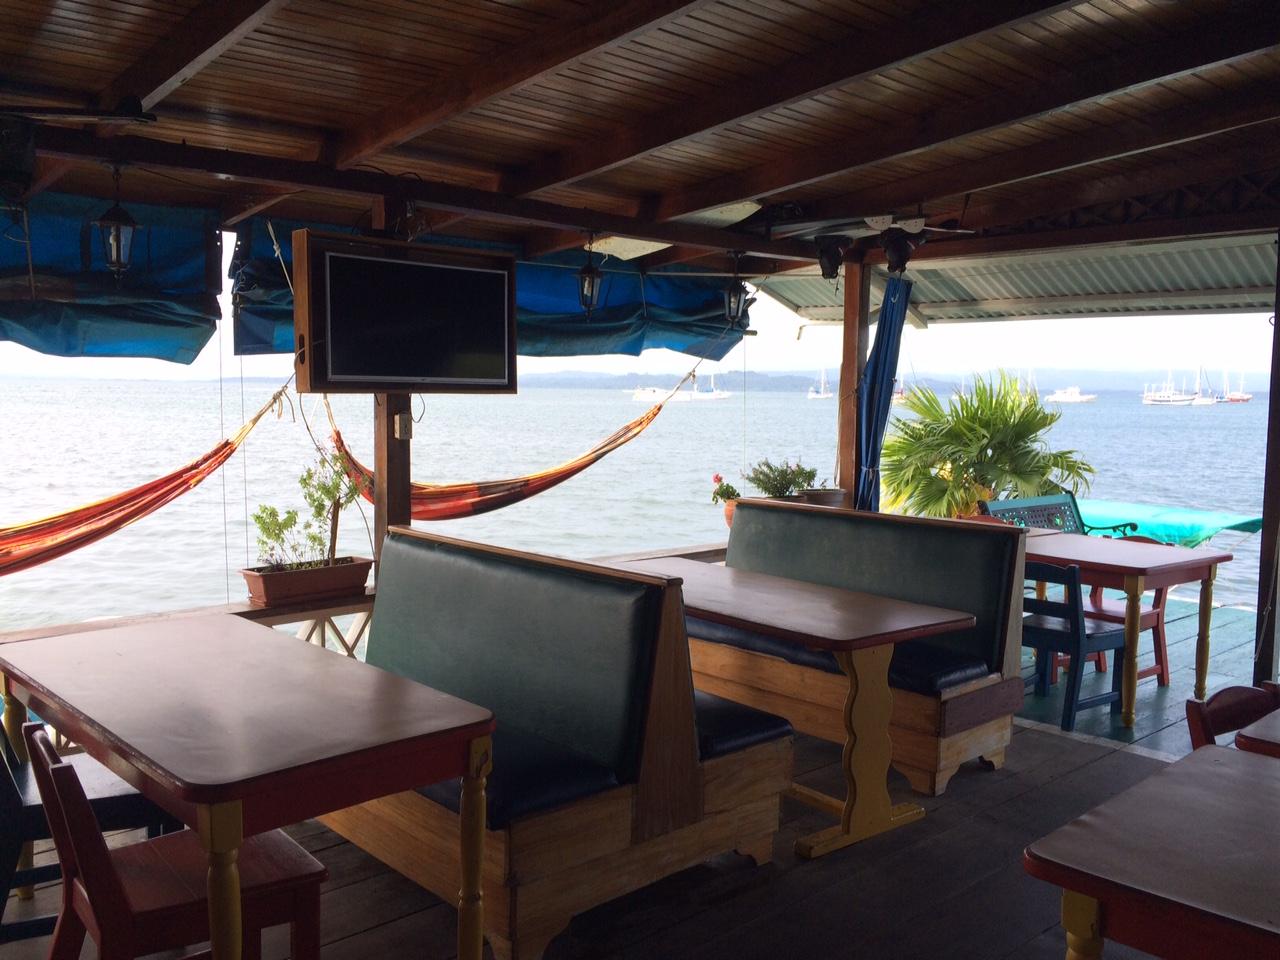 hotel olas de la madrugada bocas del toro town isla colon